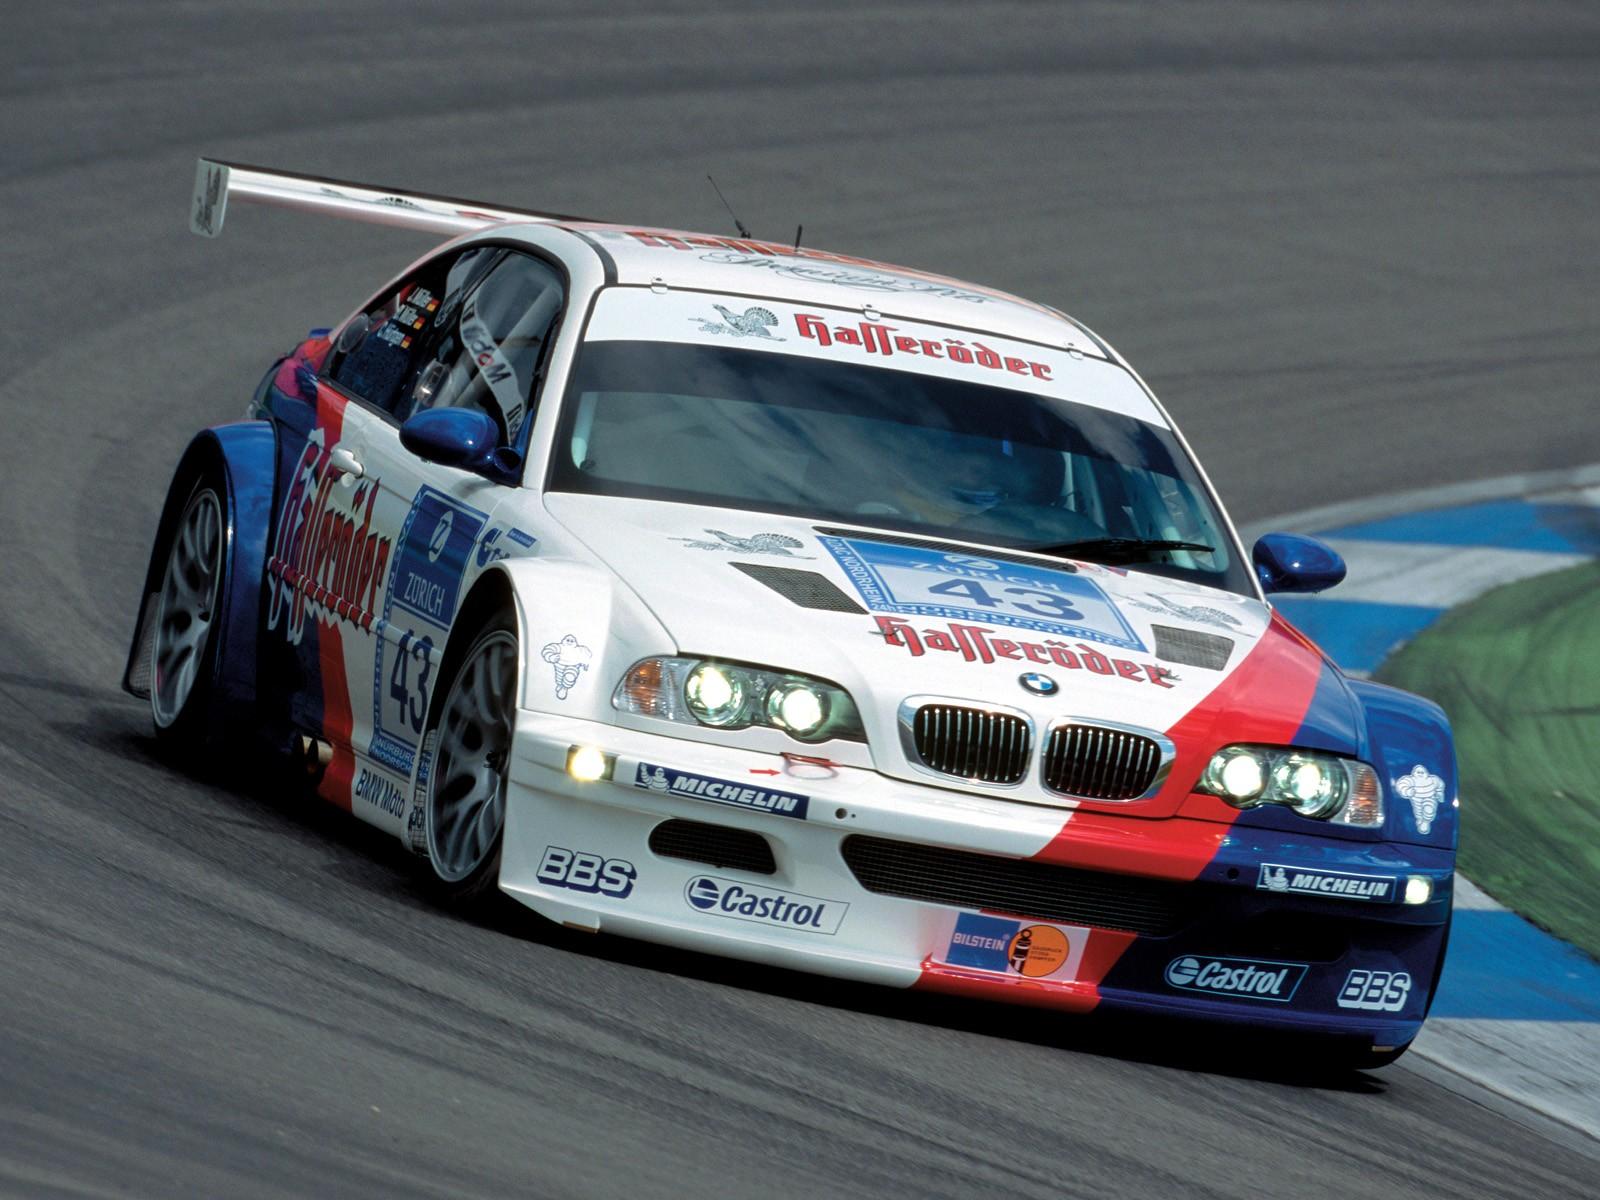 BMW M1 For Sale >> BMW M3 GTR (E46) - обзор, фото, характеристики цена БМВ М3 ГТР